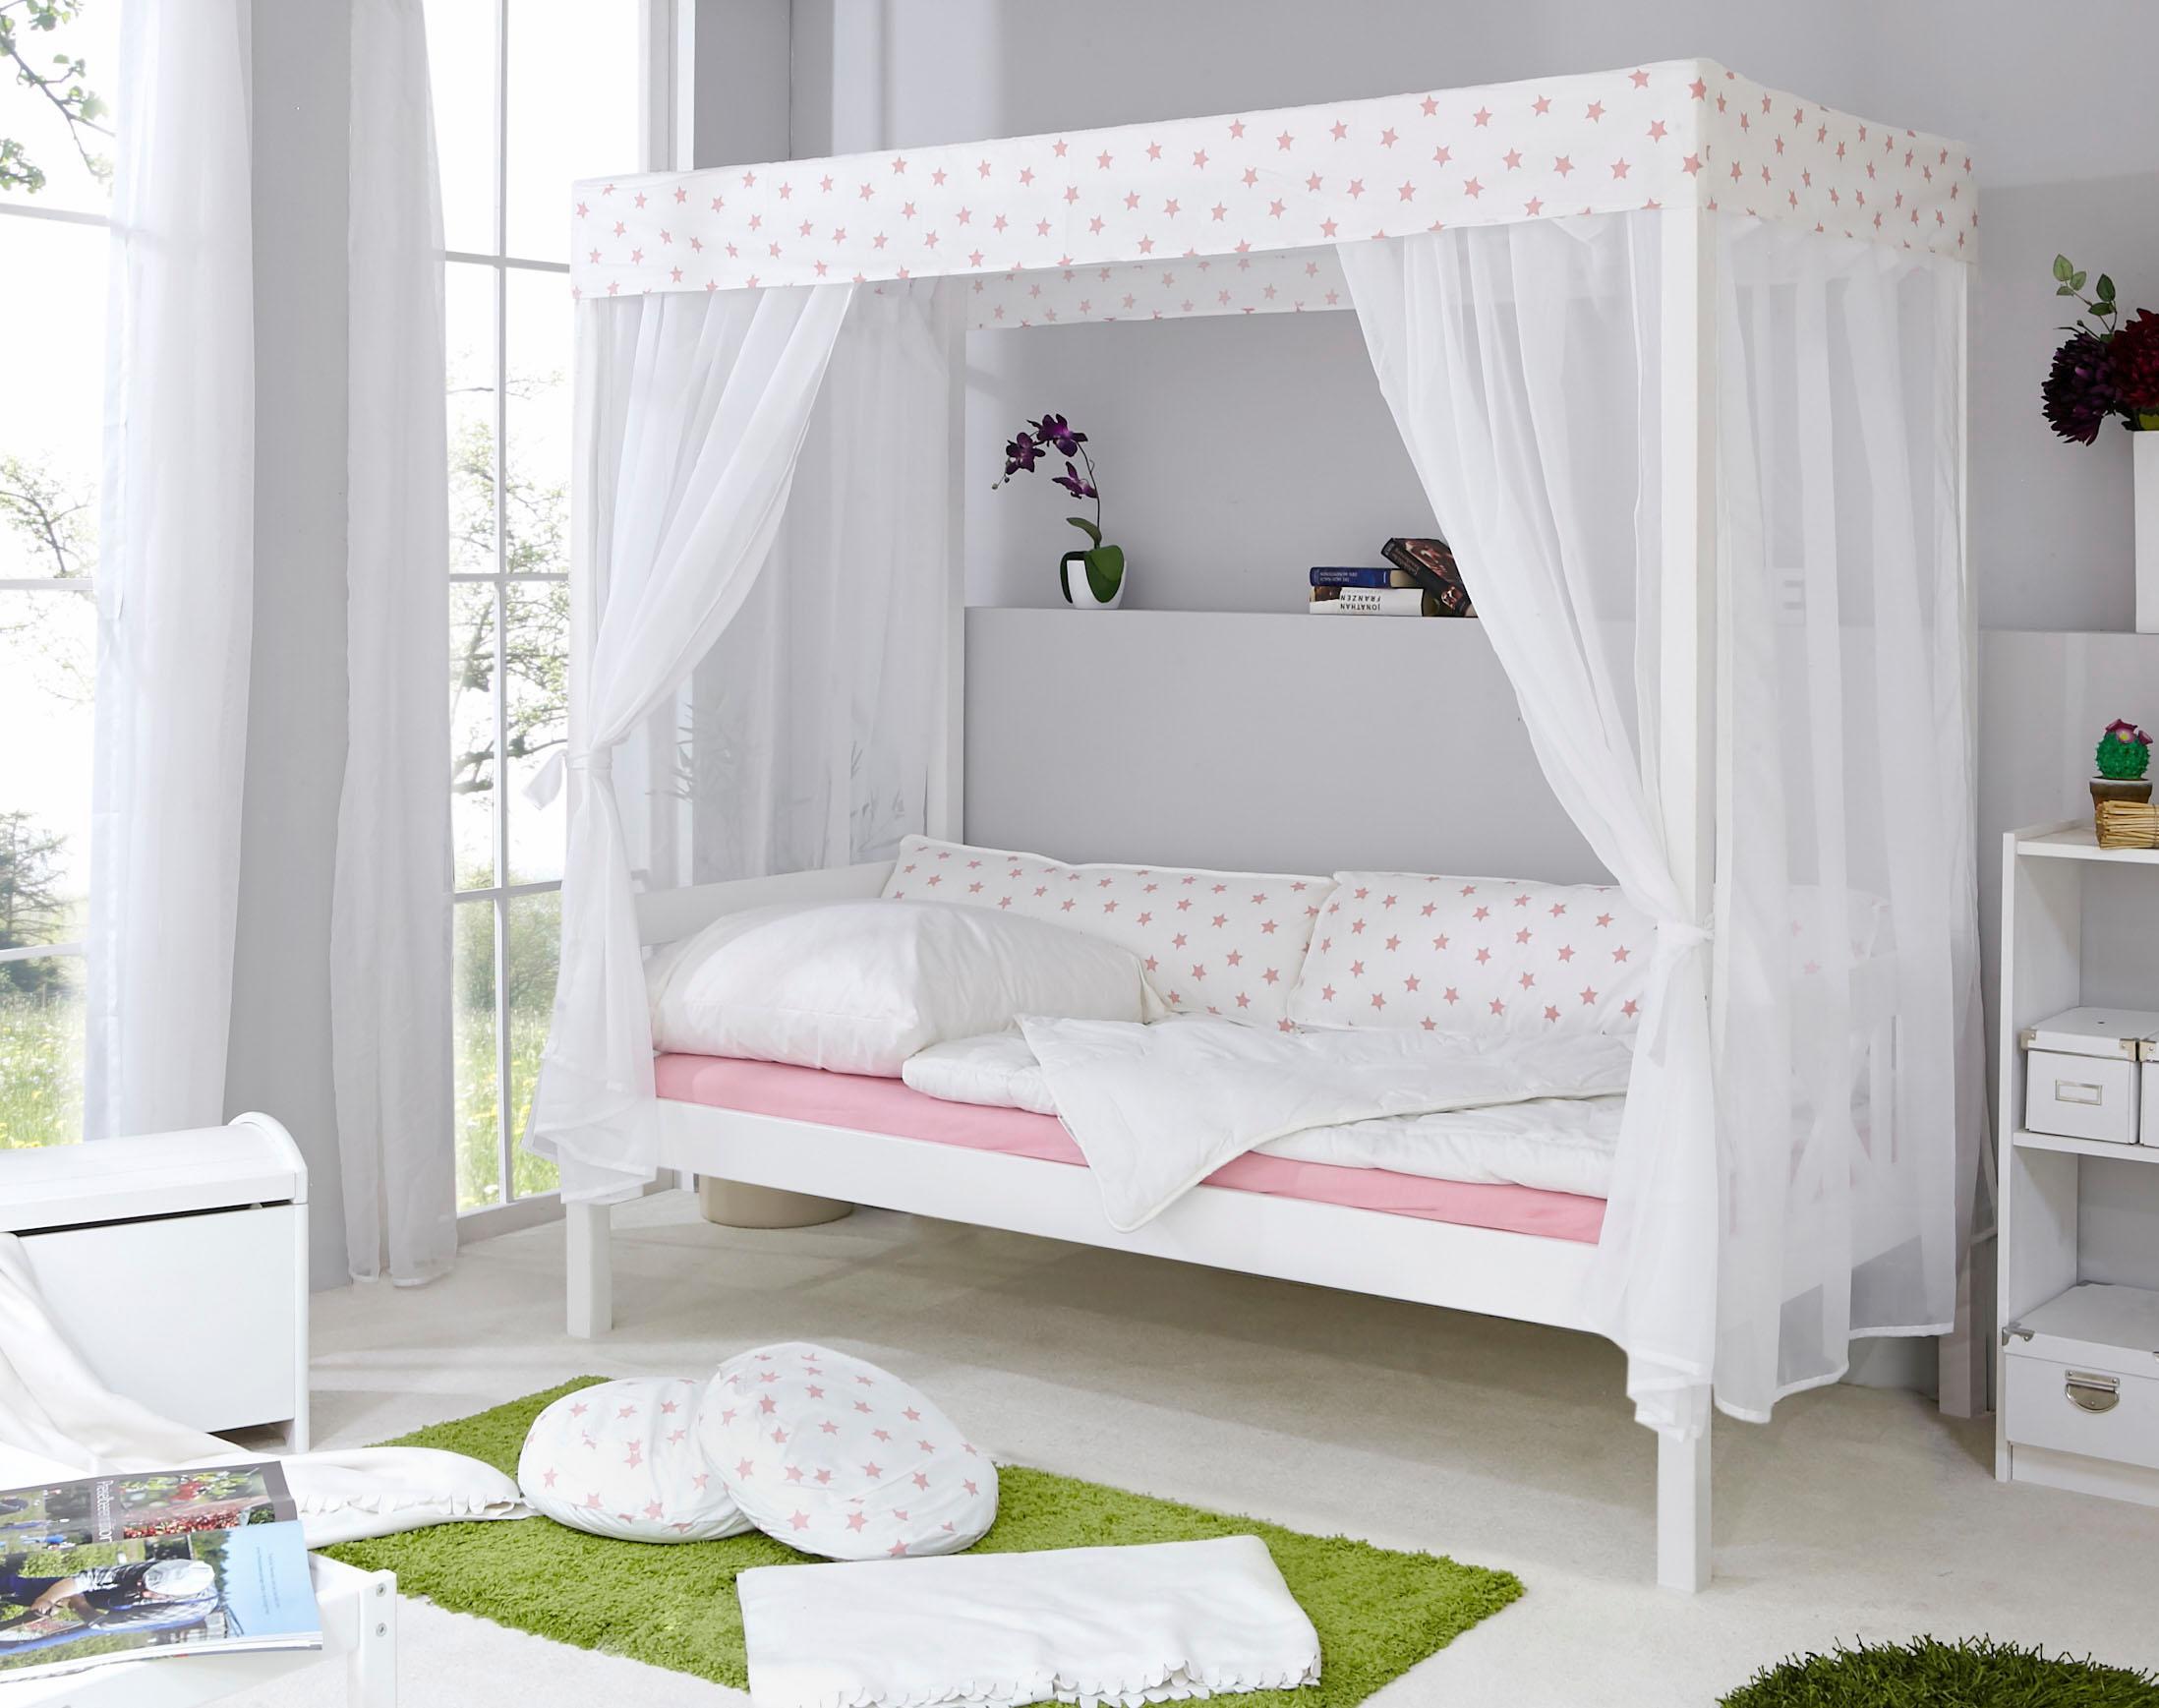 Ticaa Einzel-/Himmelbett Lino in diversen Breiten Kiefer   Schlafzimmer > Betten > Himmelbetten   Weiß   Kiefer   Ticaa